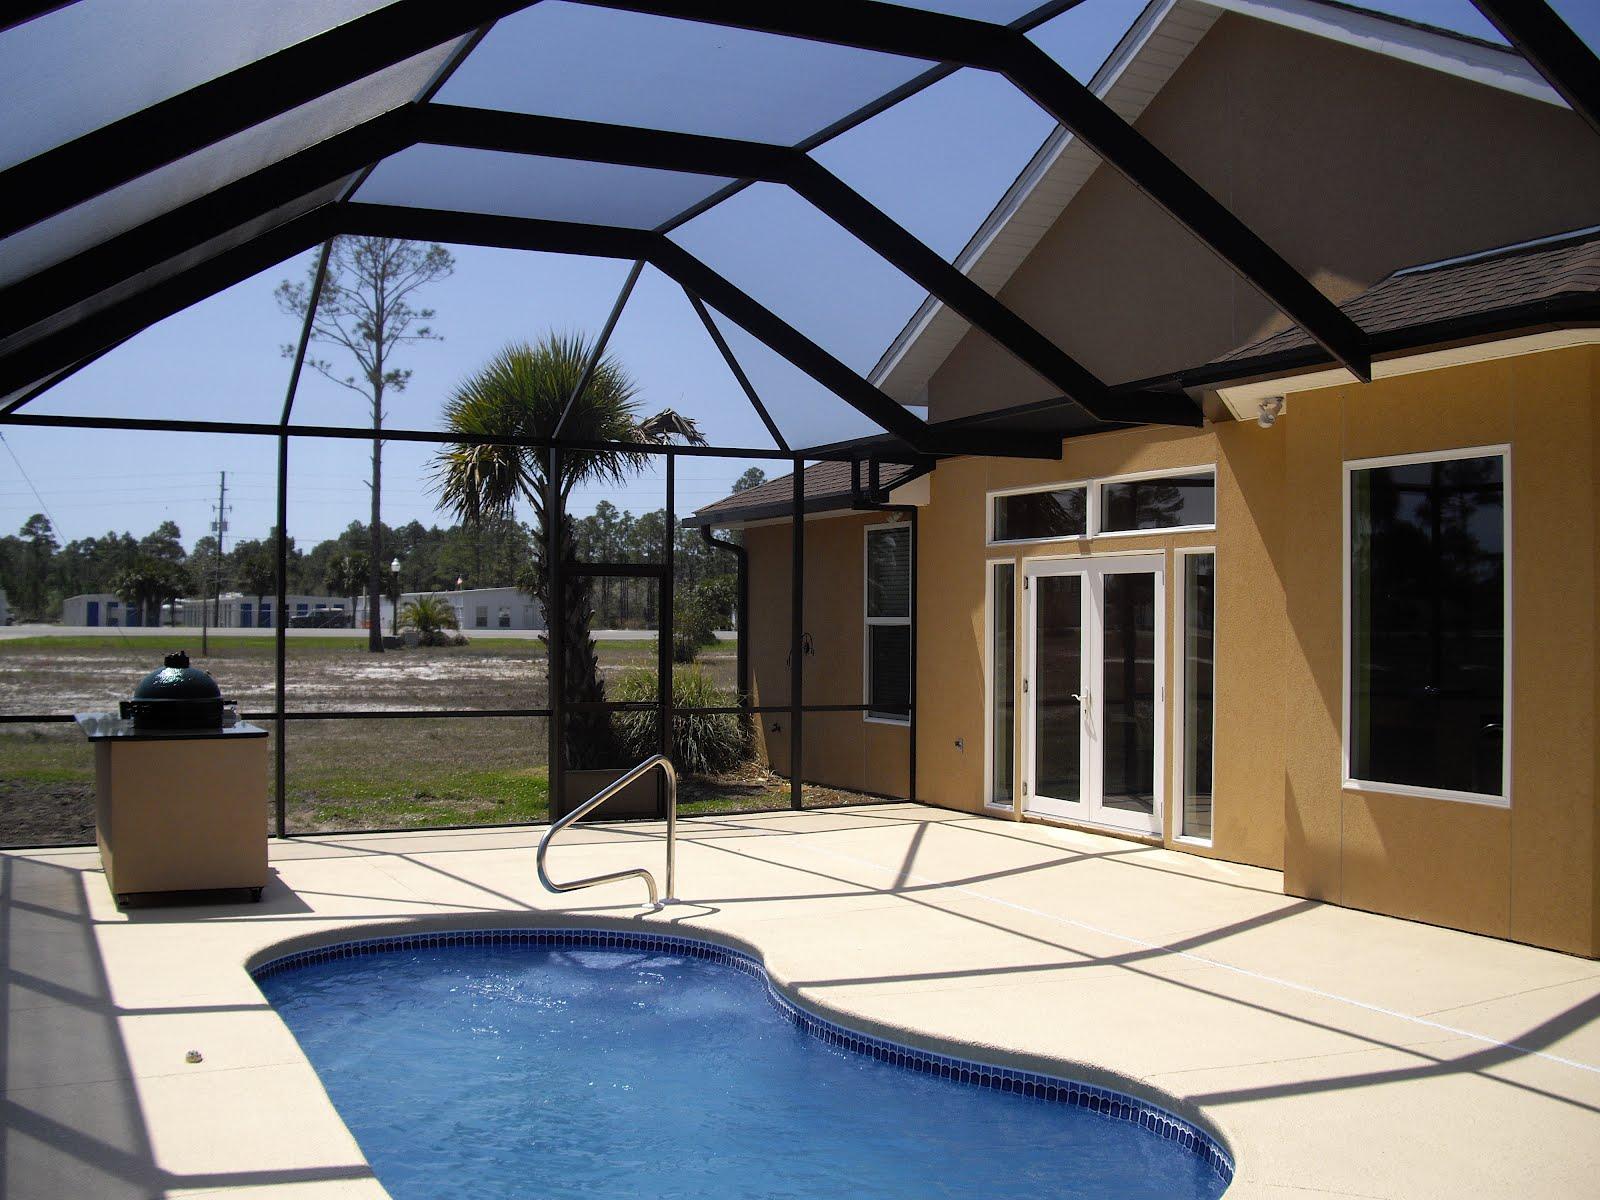 Pool enclosures prices florida american hwy for Pool enclosures prices